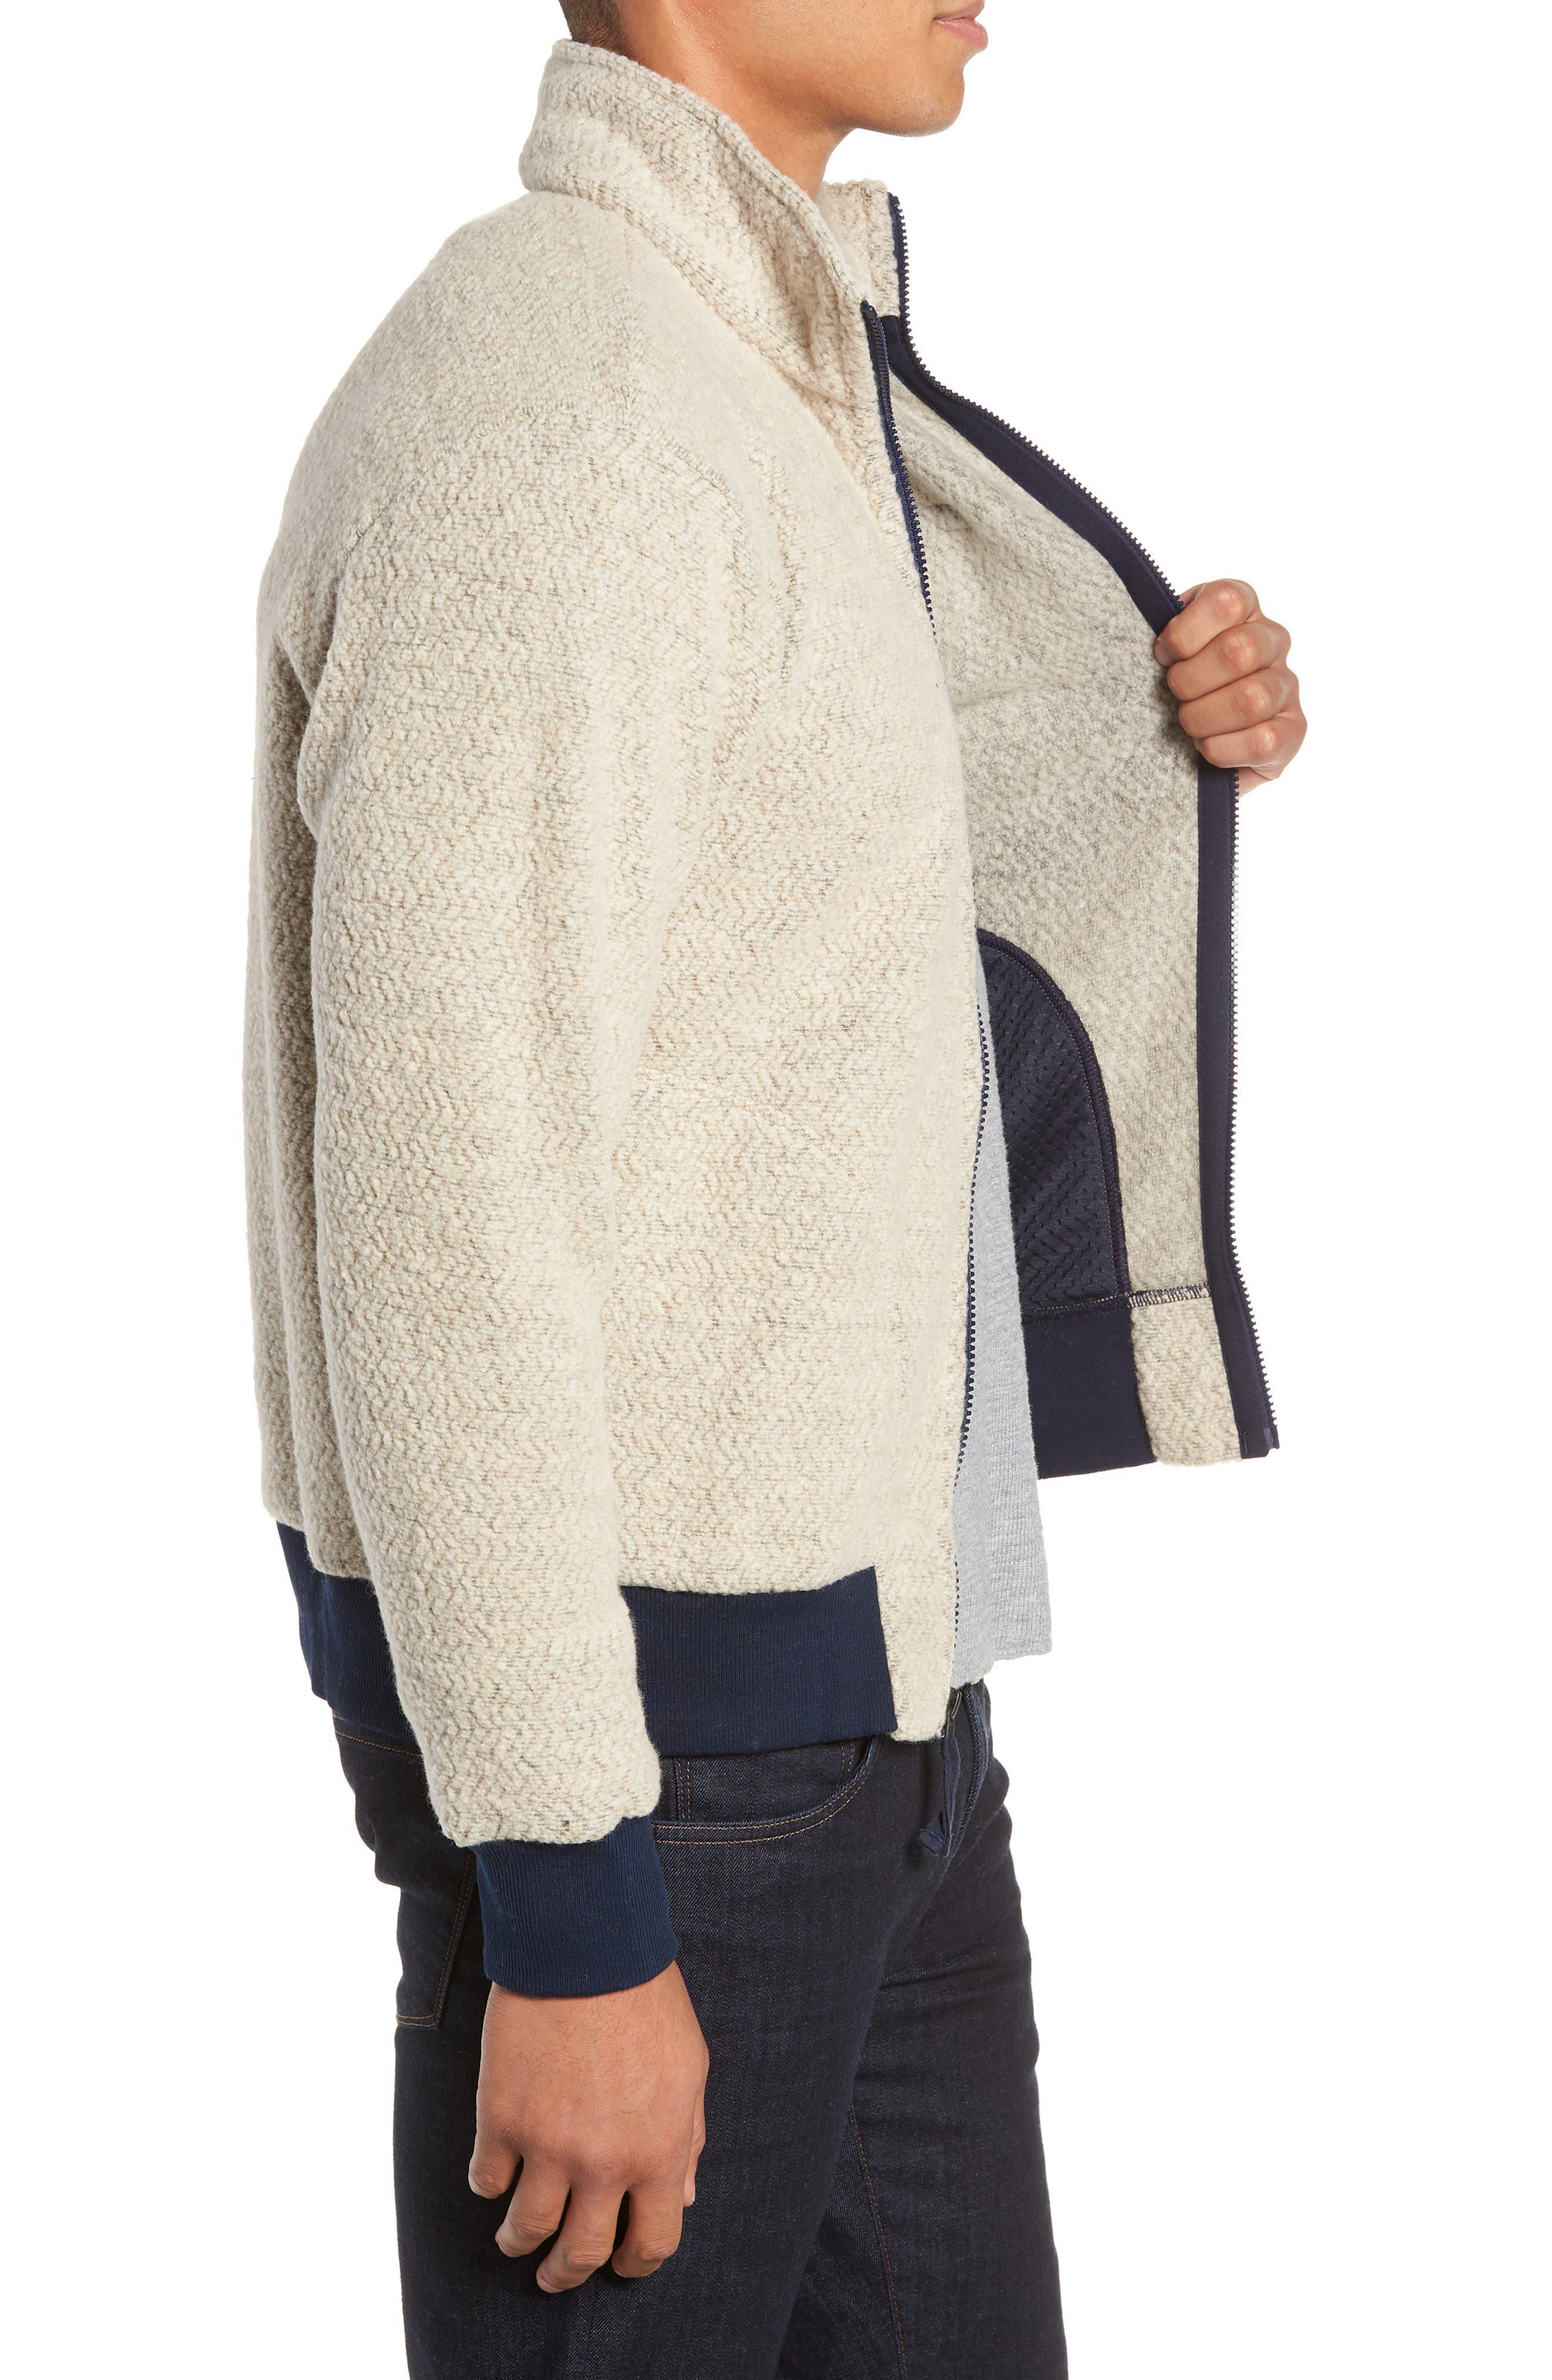 Woolyester Fleece Jacket,                             Alternate thumbnail 3, color,                             OATMEAL HEATHER